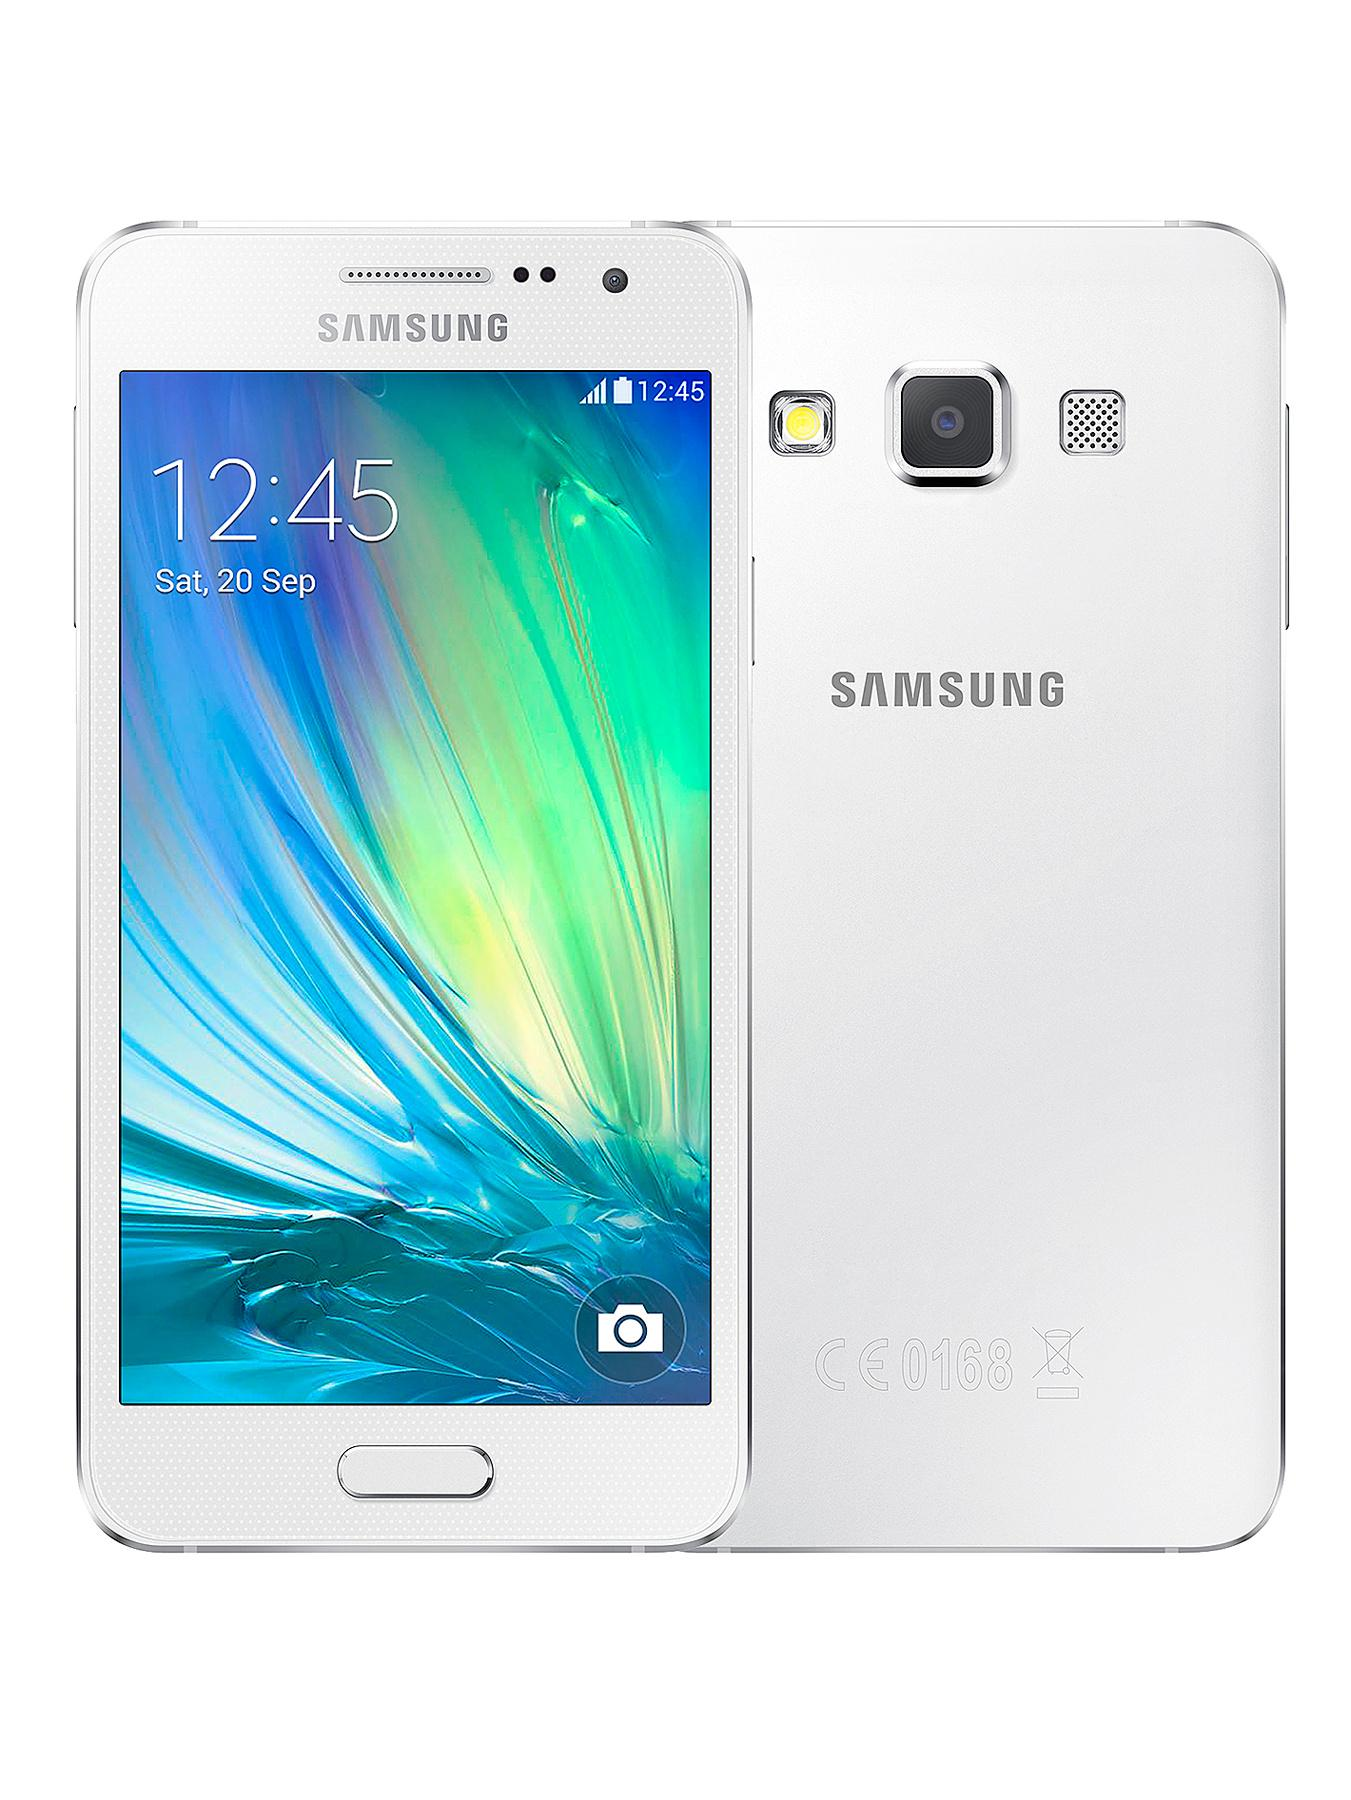 Samsung A3 Smartphone - Sim FREE Handset - White